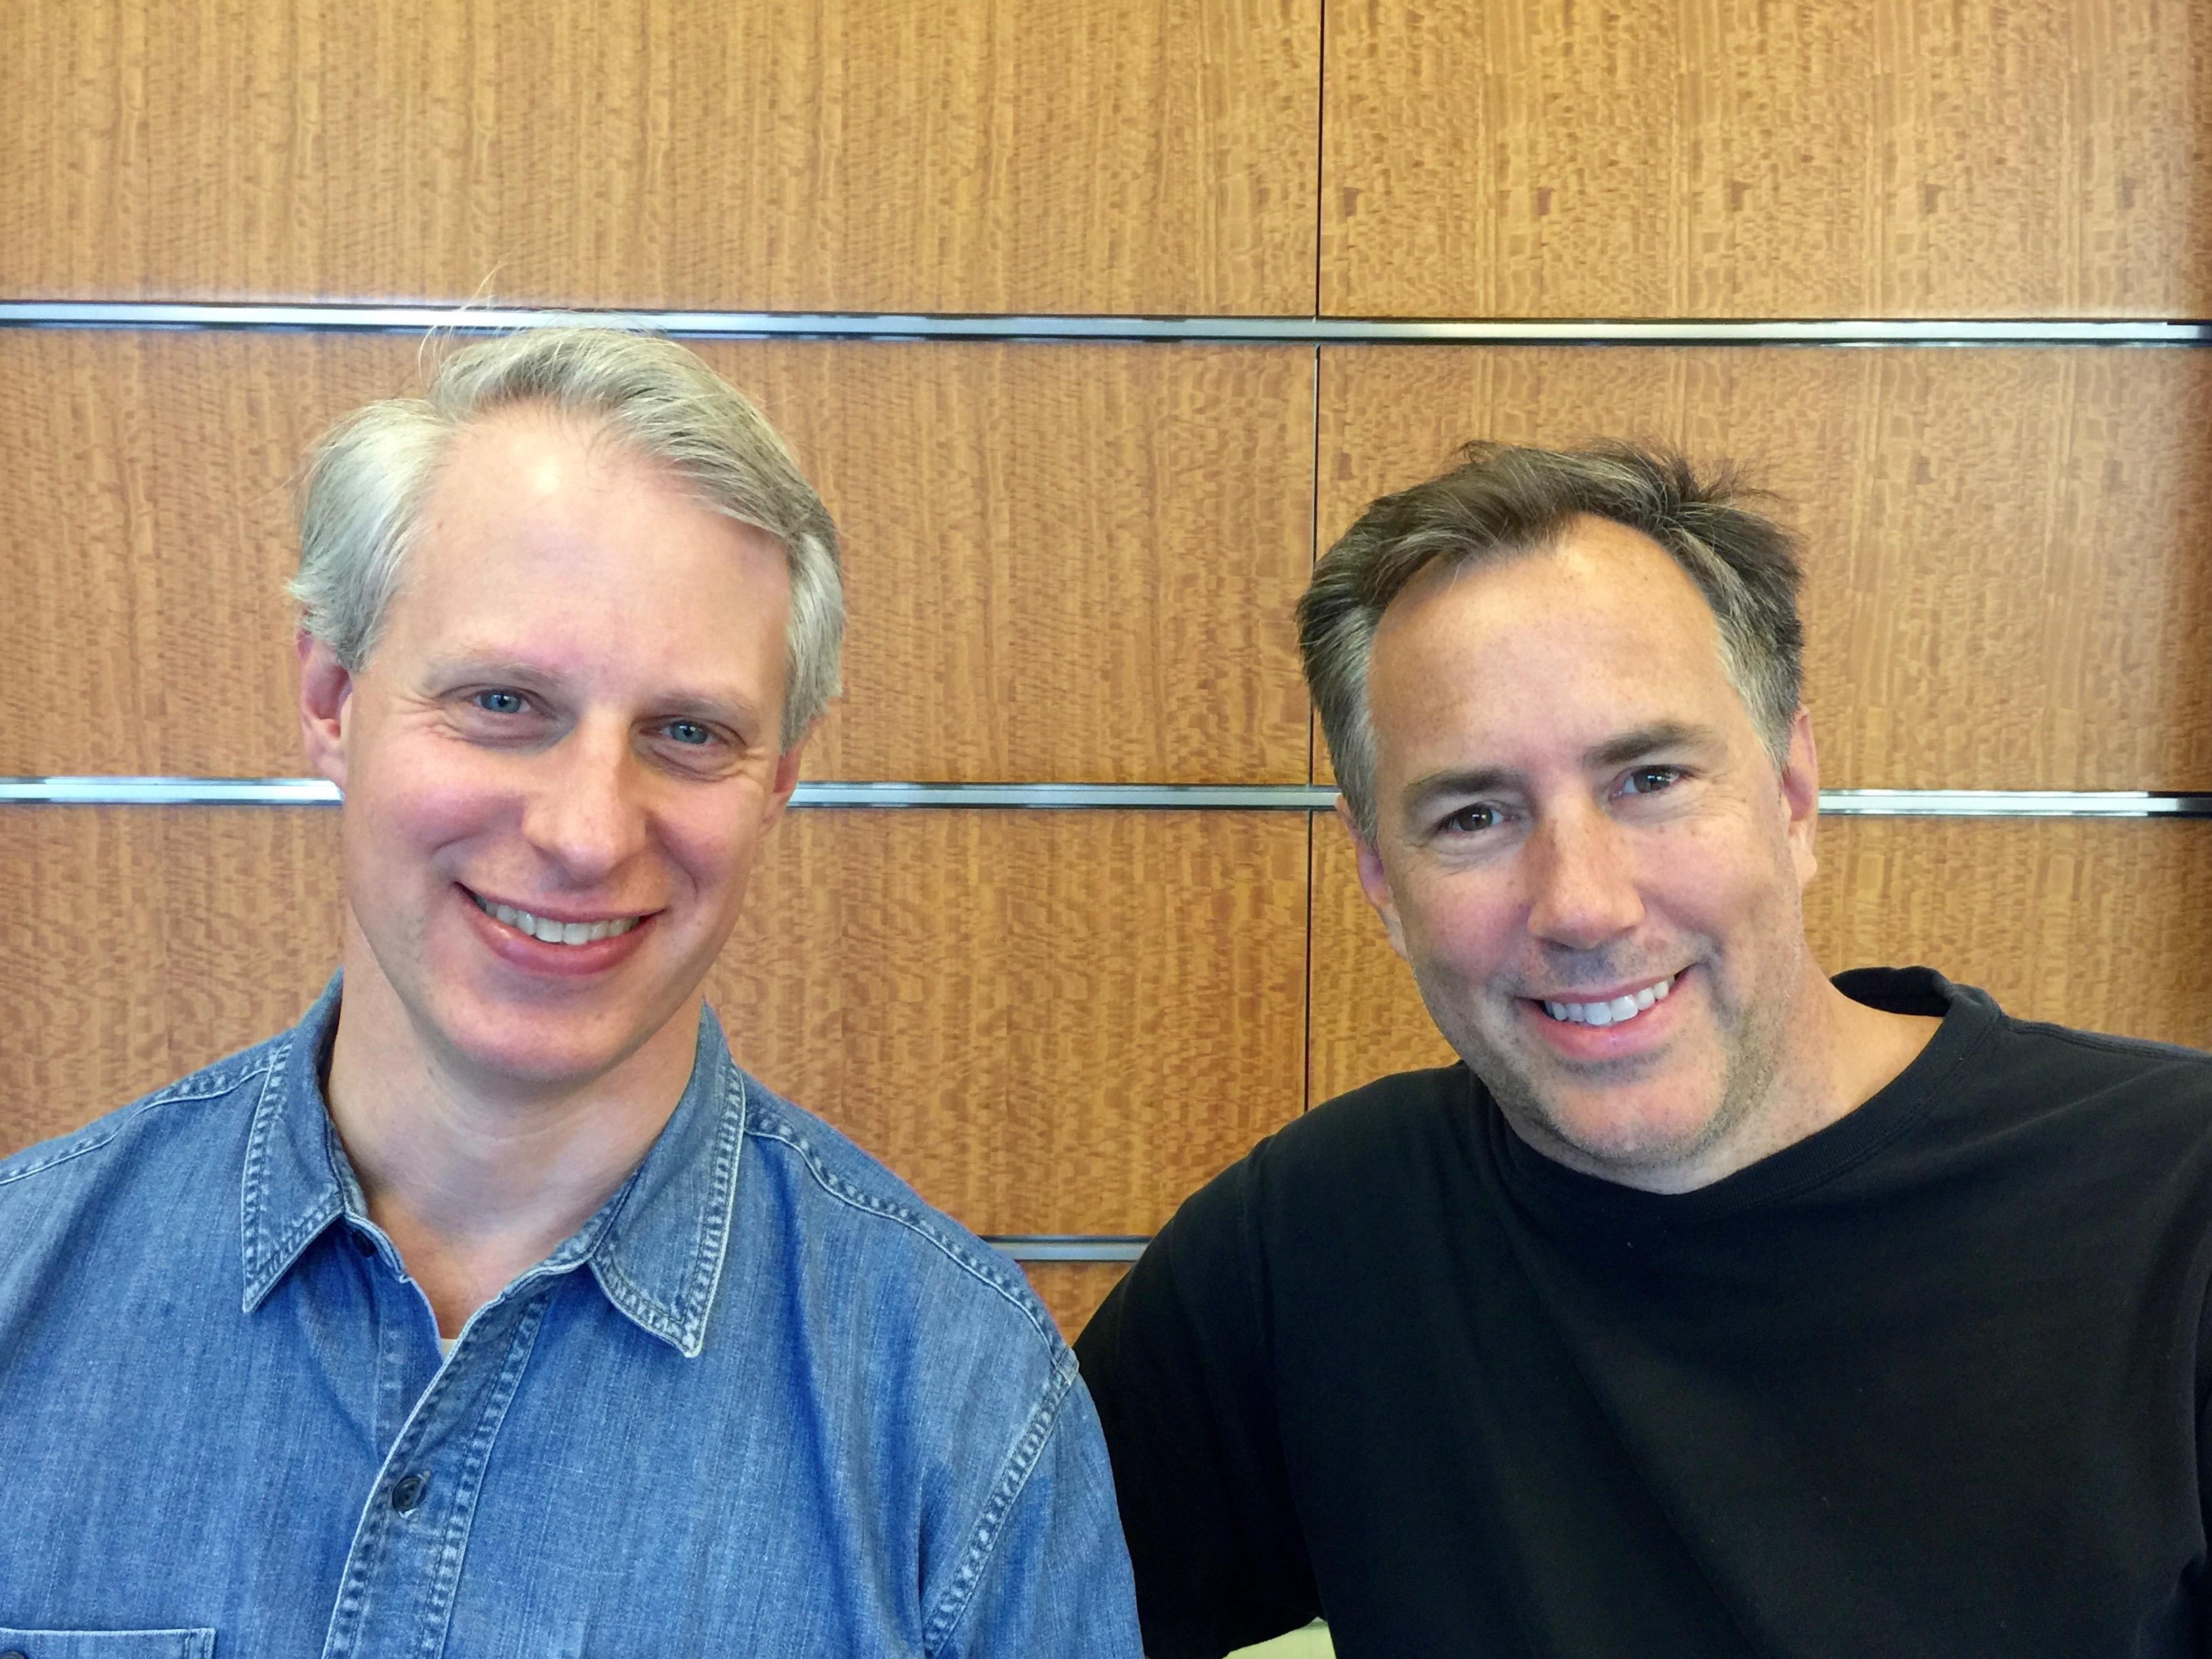 Scott Cadora and Dave Black of Medicare Pathfinder